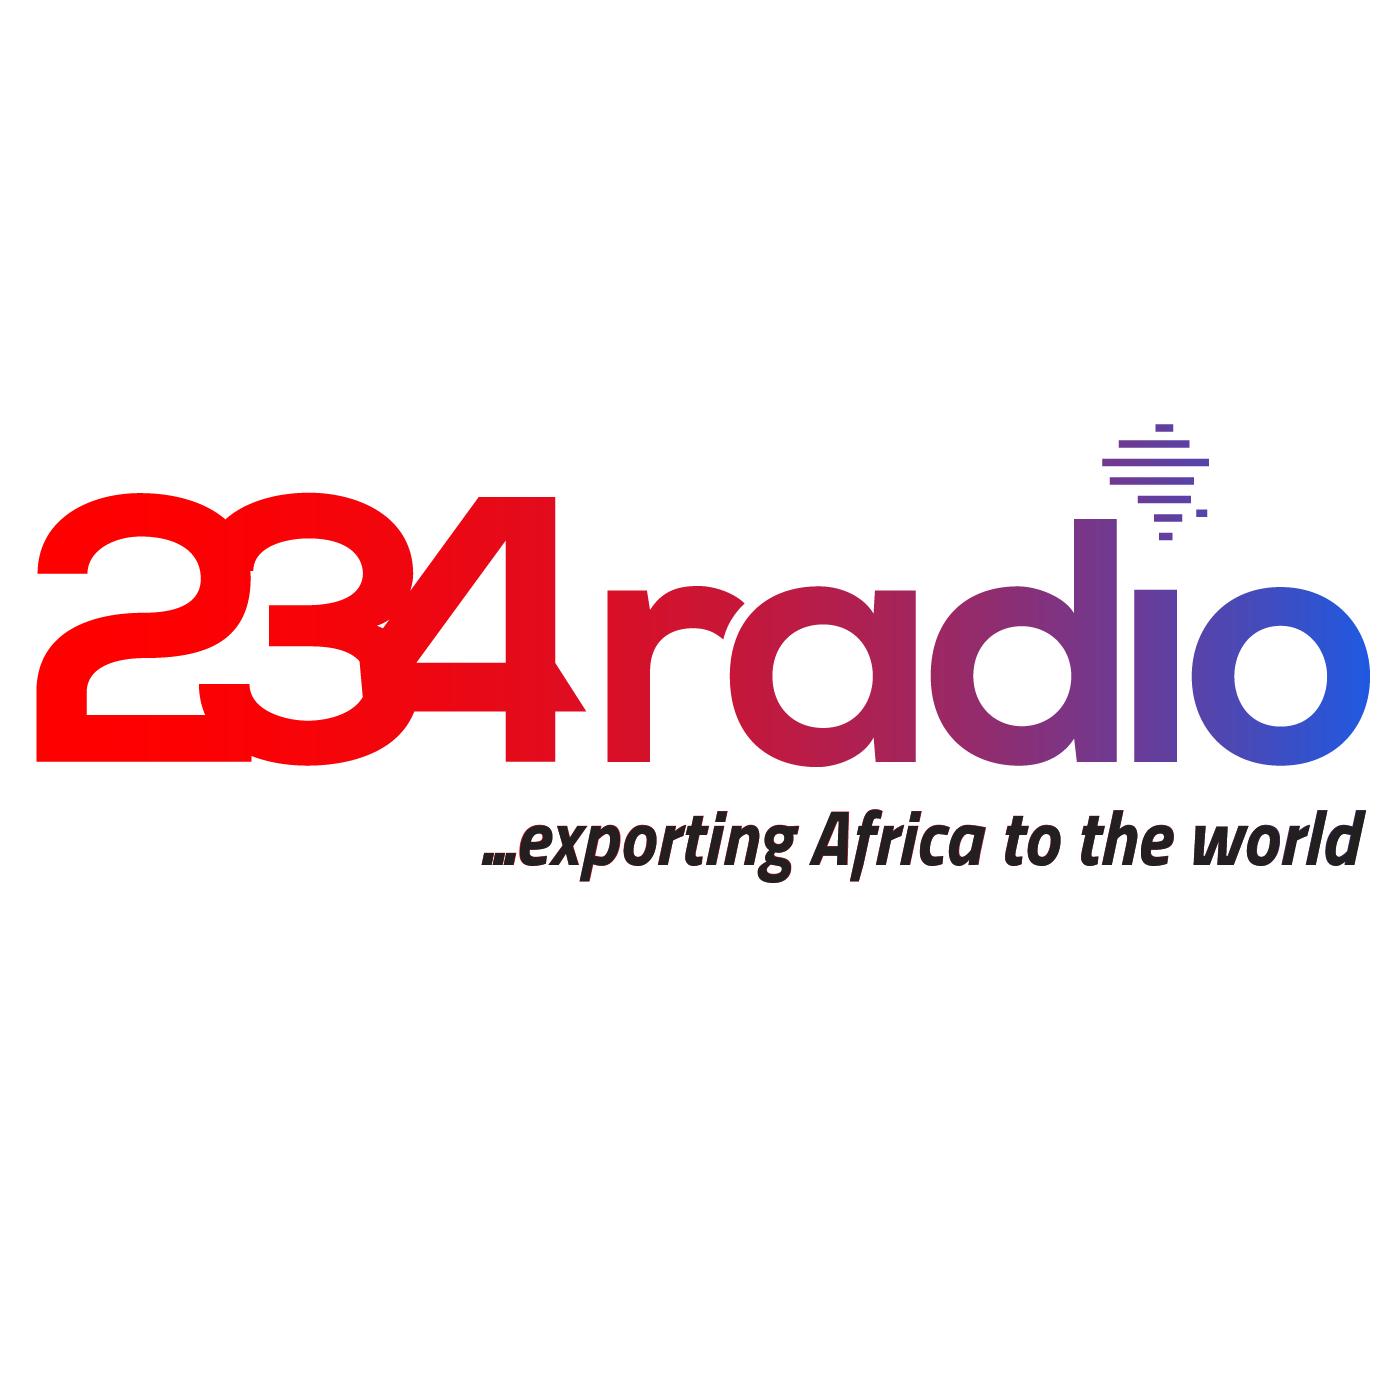 Радио 234Radio Нигерия, Лагос